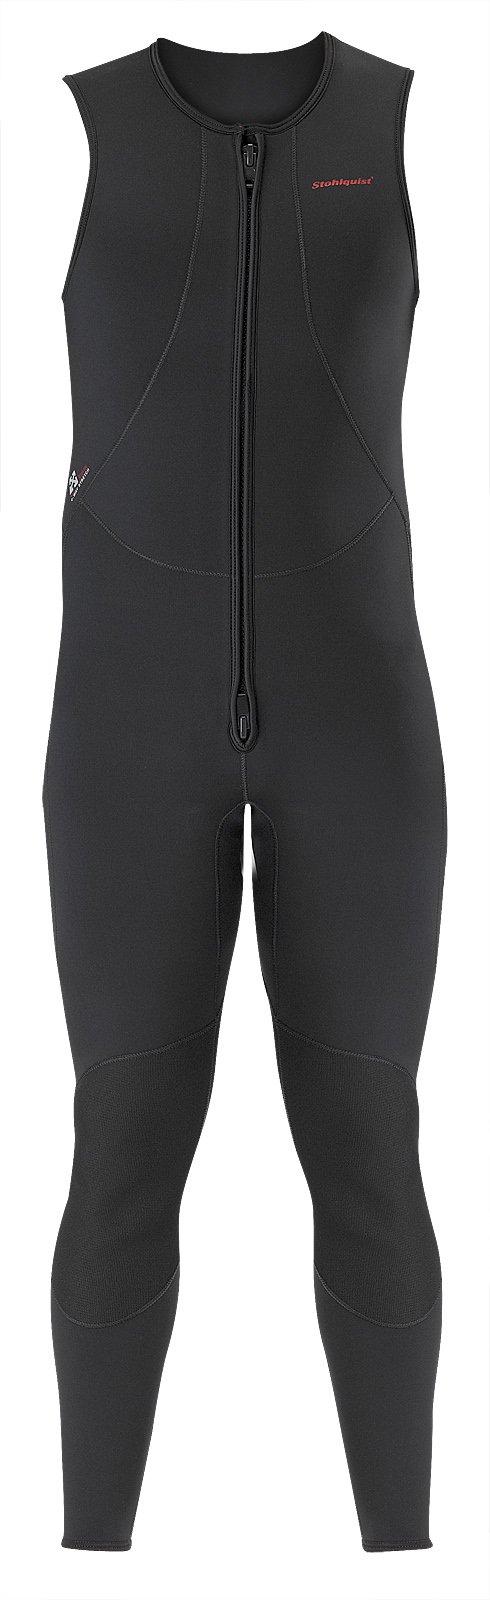 Stohlquist Men's Rapid John Wetsuit, Black, Large by Stohlquist Waterware